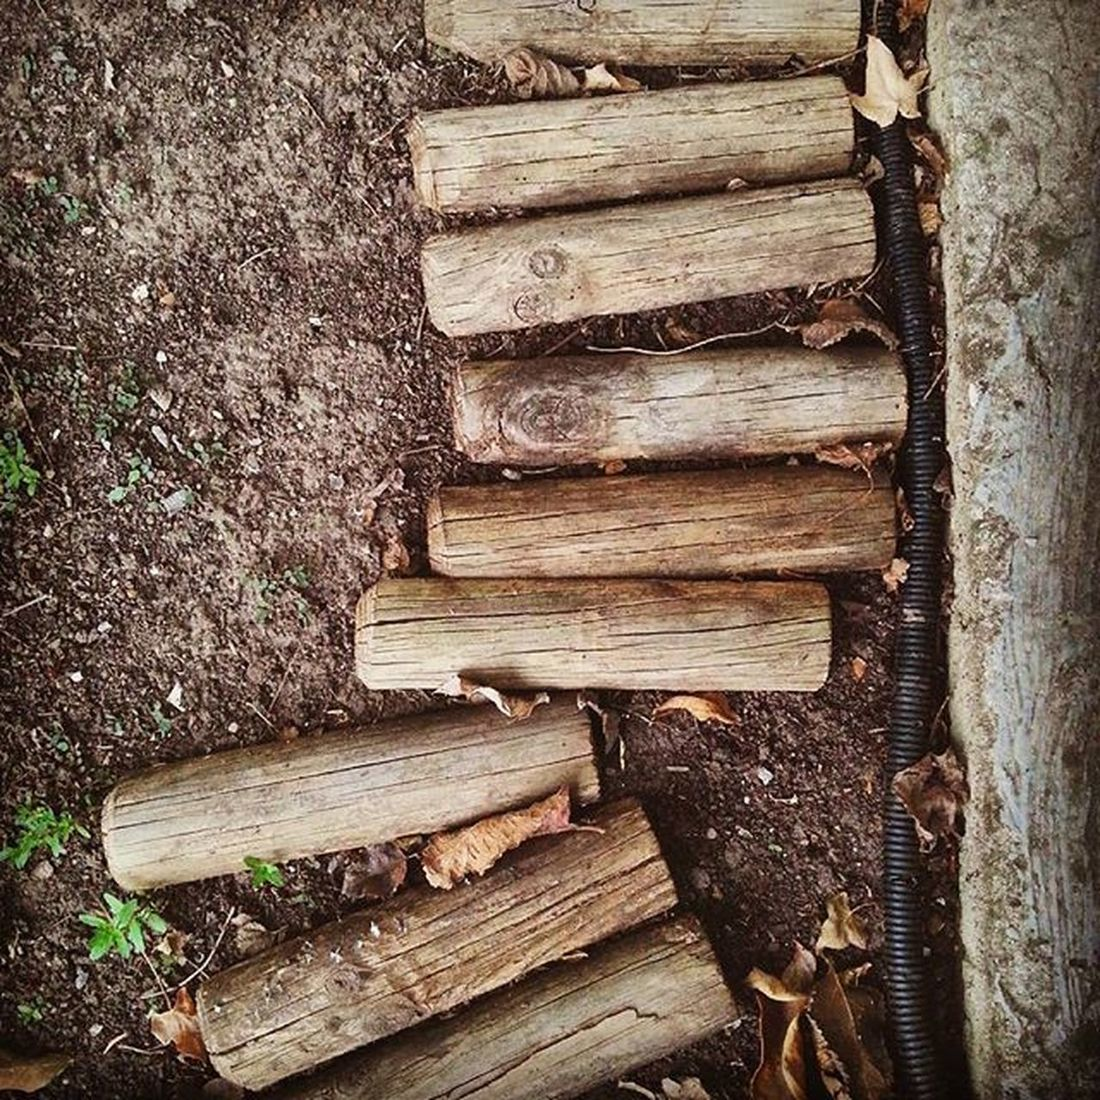 100happydays Listones de madera. Listones Demadera Tiras Tablas Wood Wooden Ribbons Planks Panels árbol Tree Nature Land Ground Dust Tierra Vegetacion